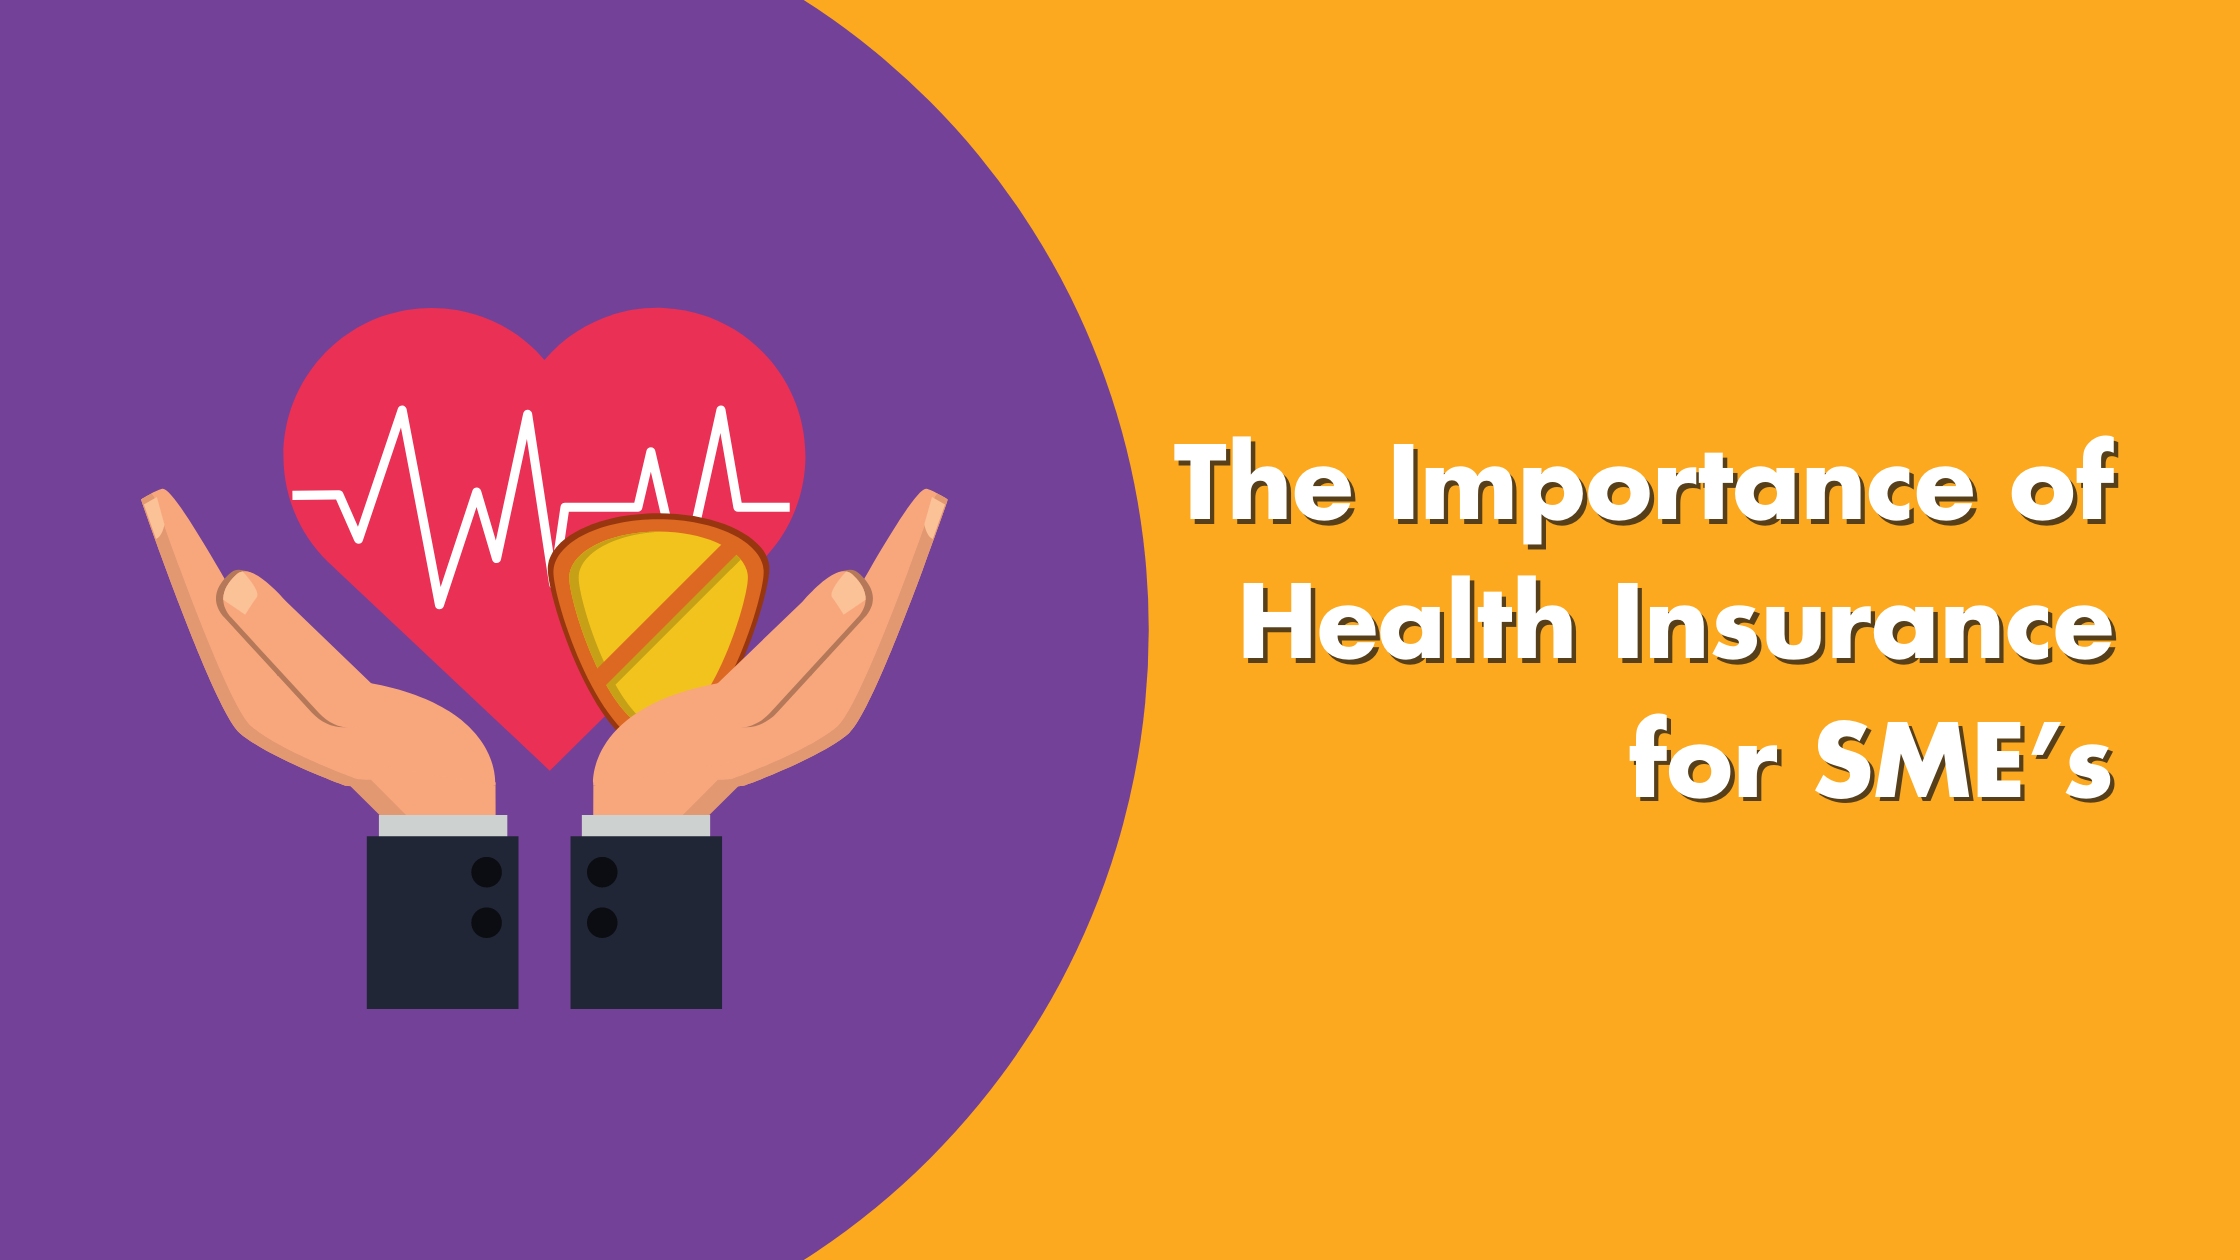 Health Insurance For SME's